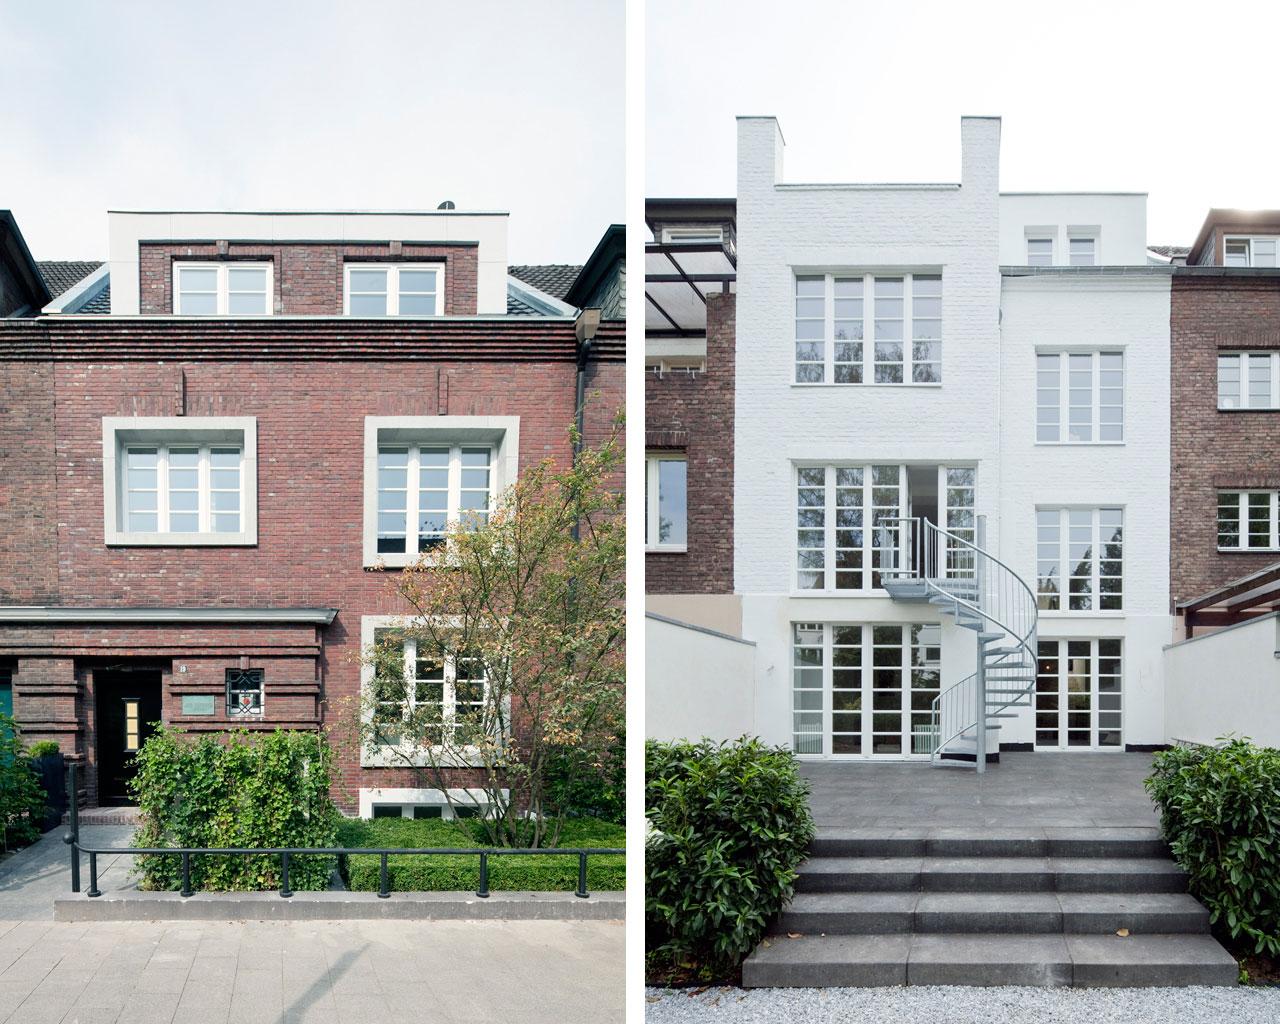 Stadtvilla innenarchitektur  Architekturbüro Angelika Hülser Stöhr: UMBAU MIT INNENARCHITEKTUR ...